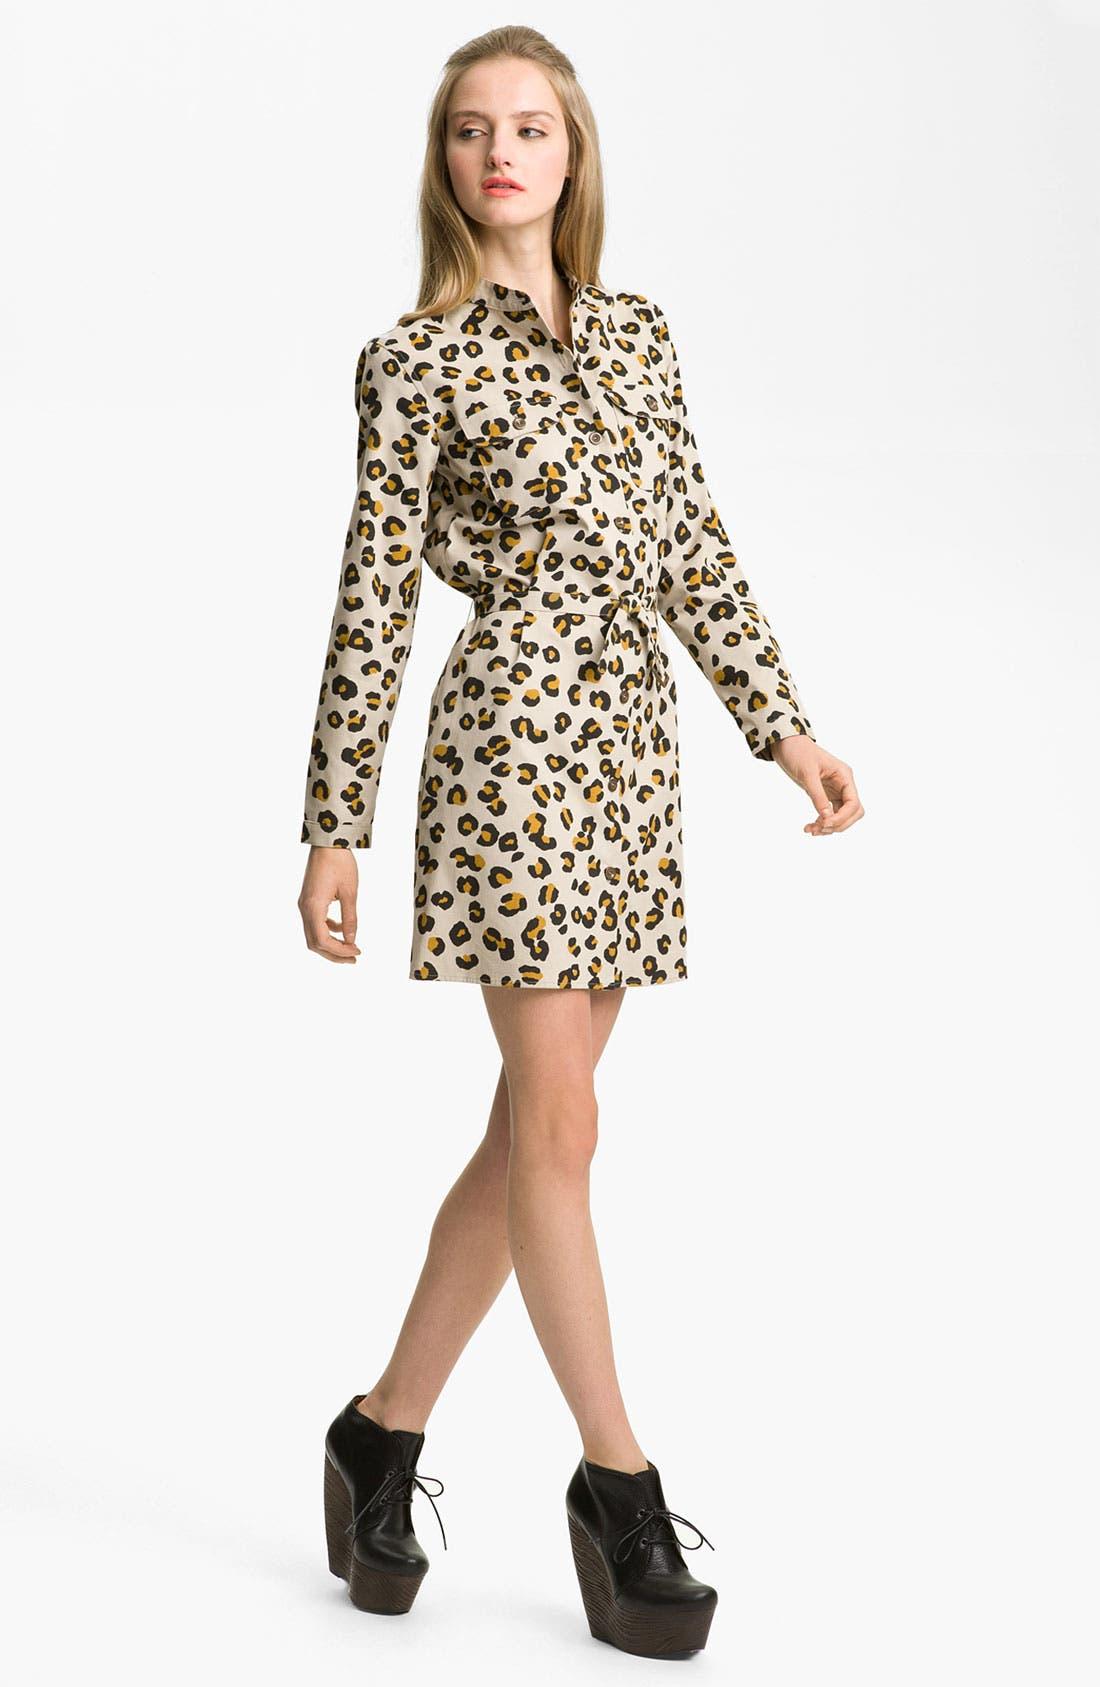 Alternate Image 1 Selected - A.P.C. Leopard Print Gabardine Shirtdress